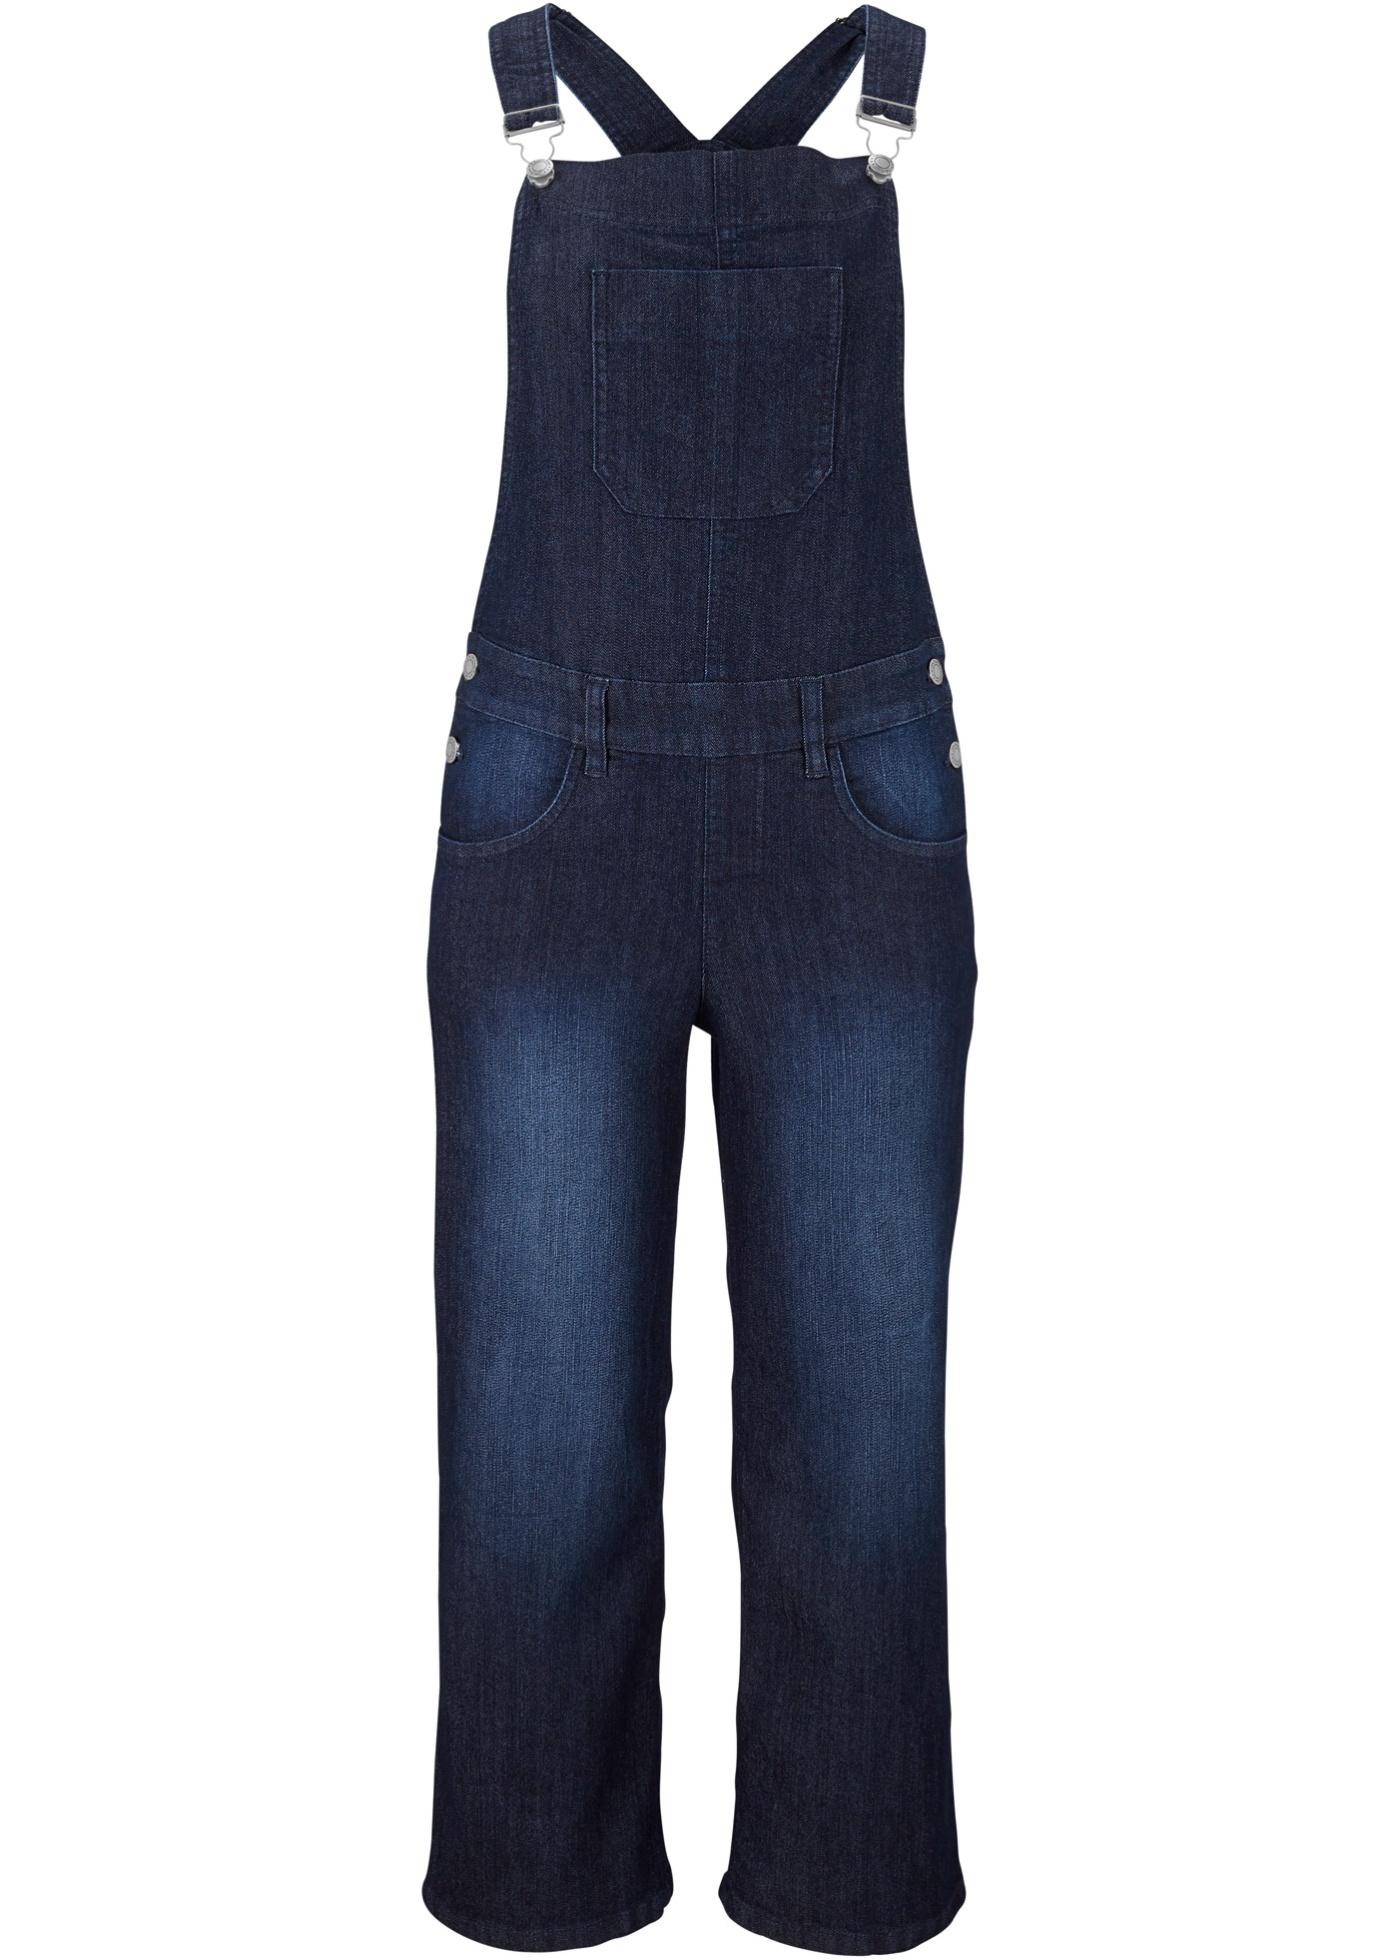 Hosen - Komfort Stretch Jeans Latzhose, Wide › bonprix › blau  - Onlineshop Bonprix